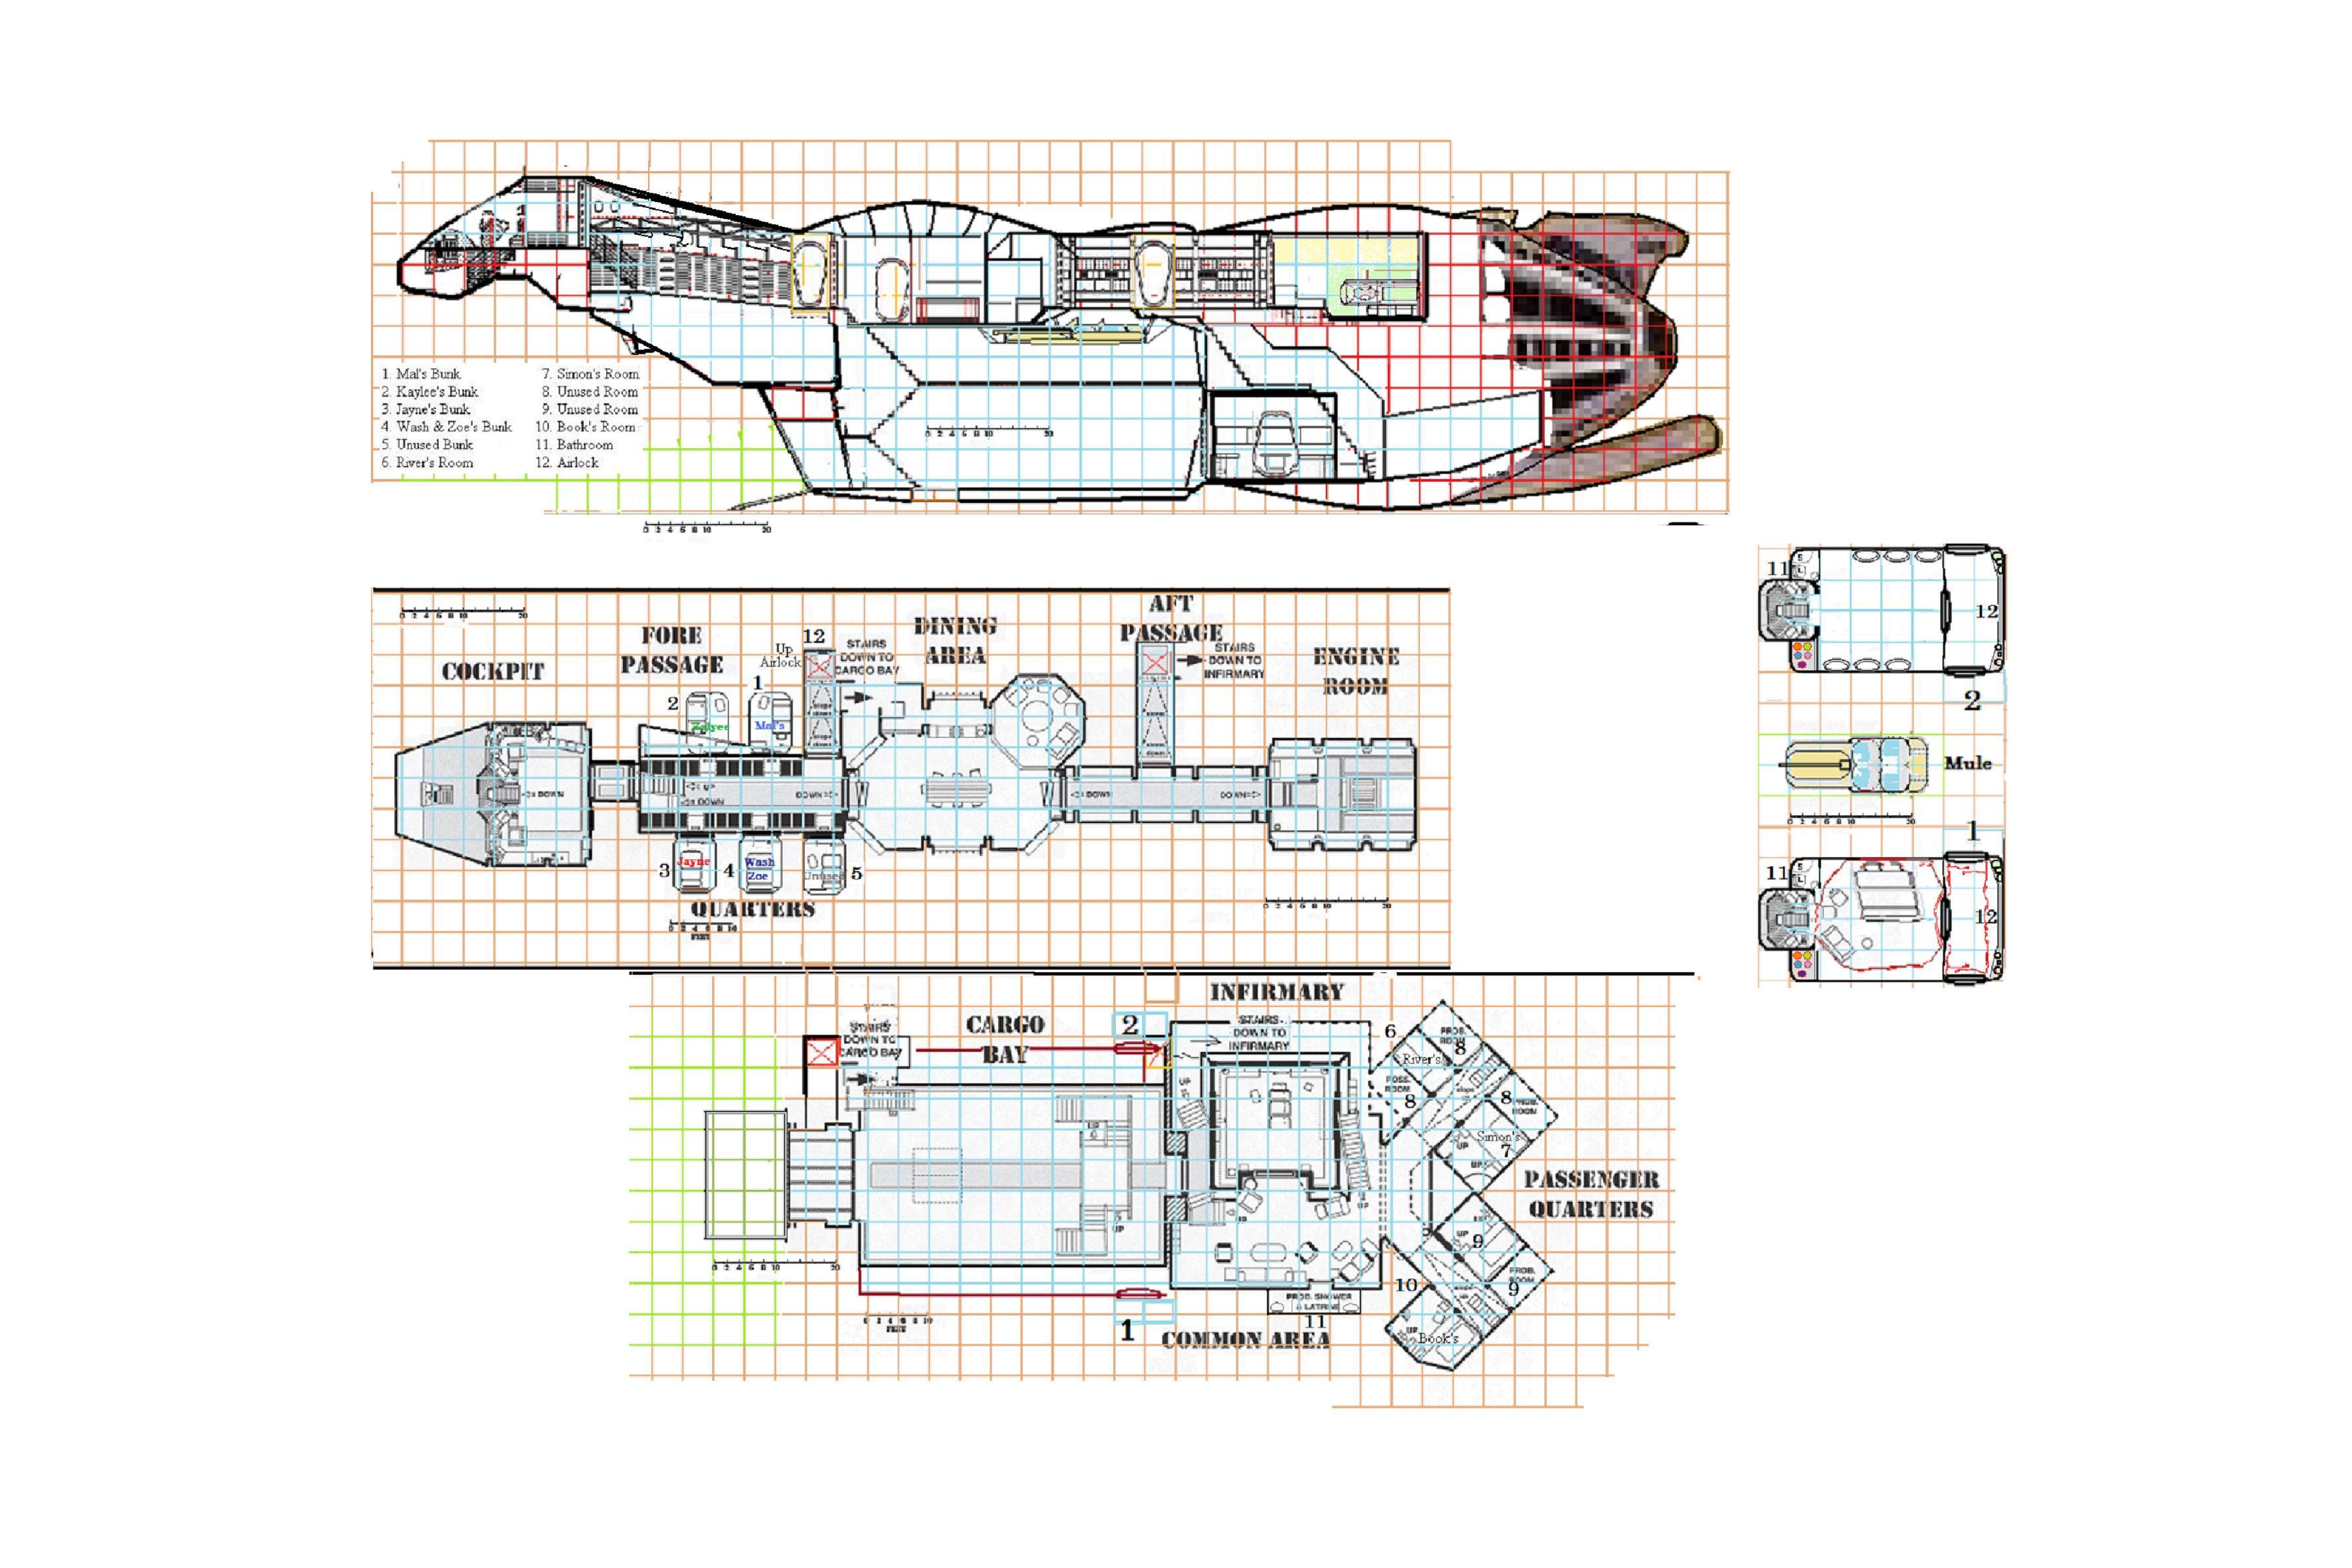 firefly ship schematics    radwulf59.deviantart.com